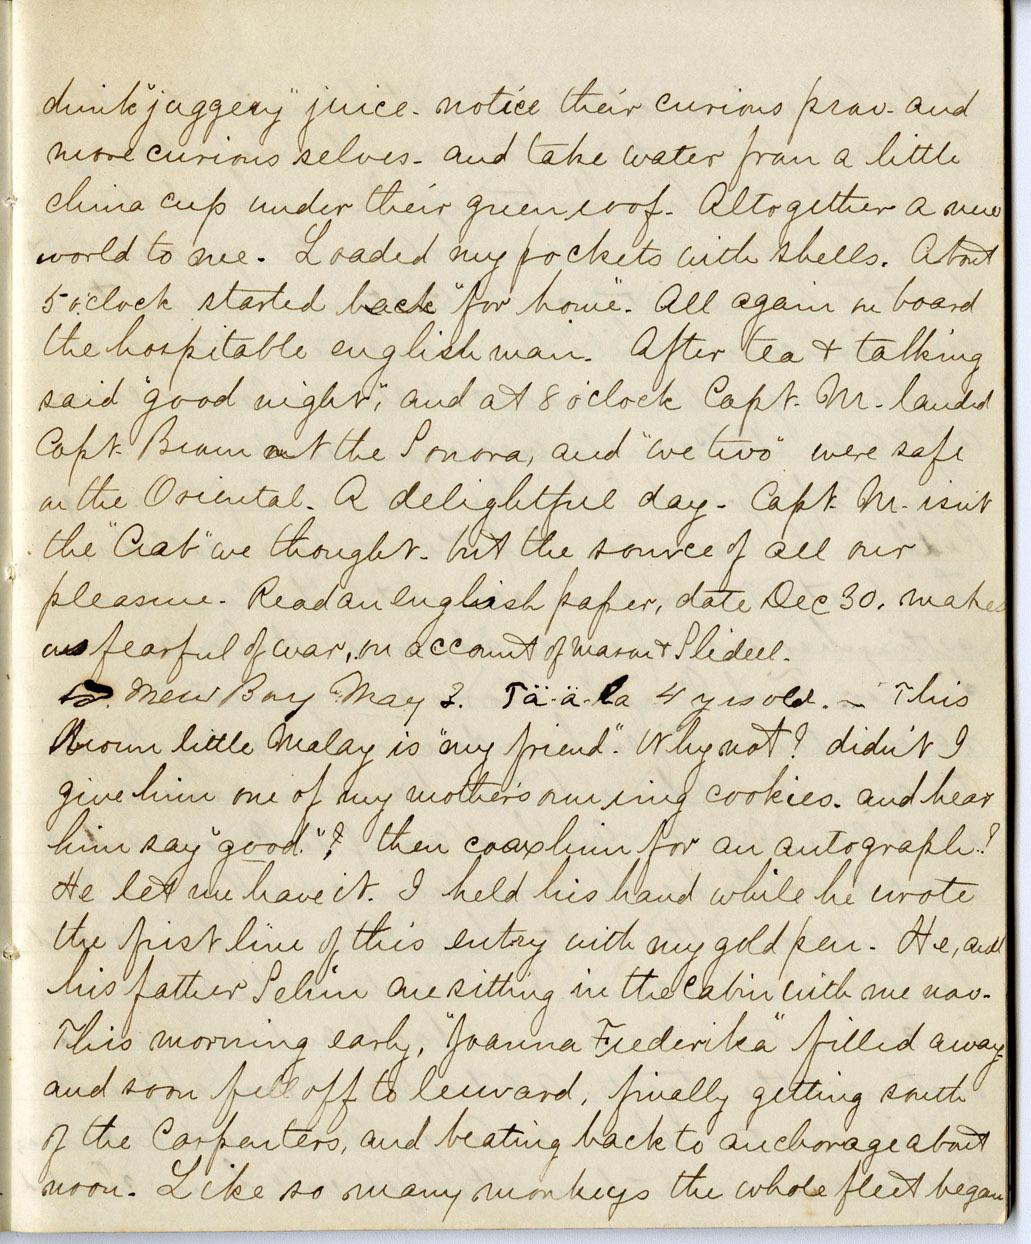 Cornelius Gold Journal, Page 26